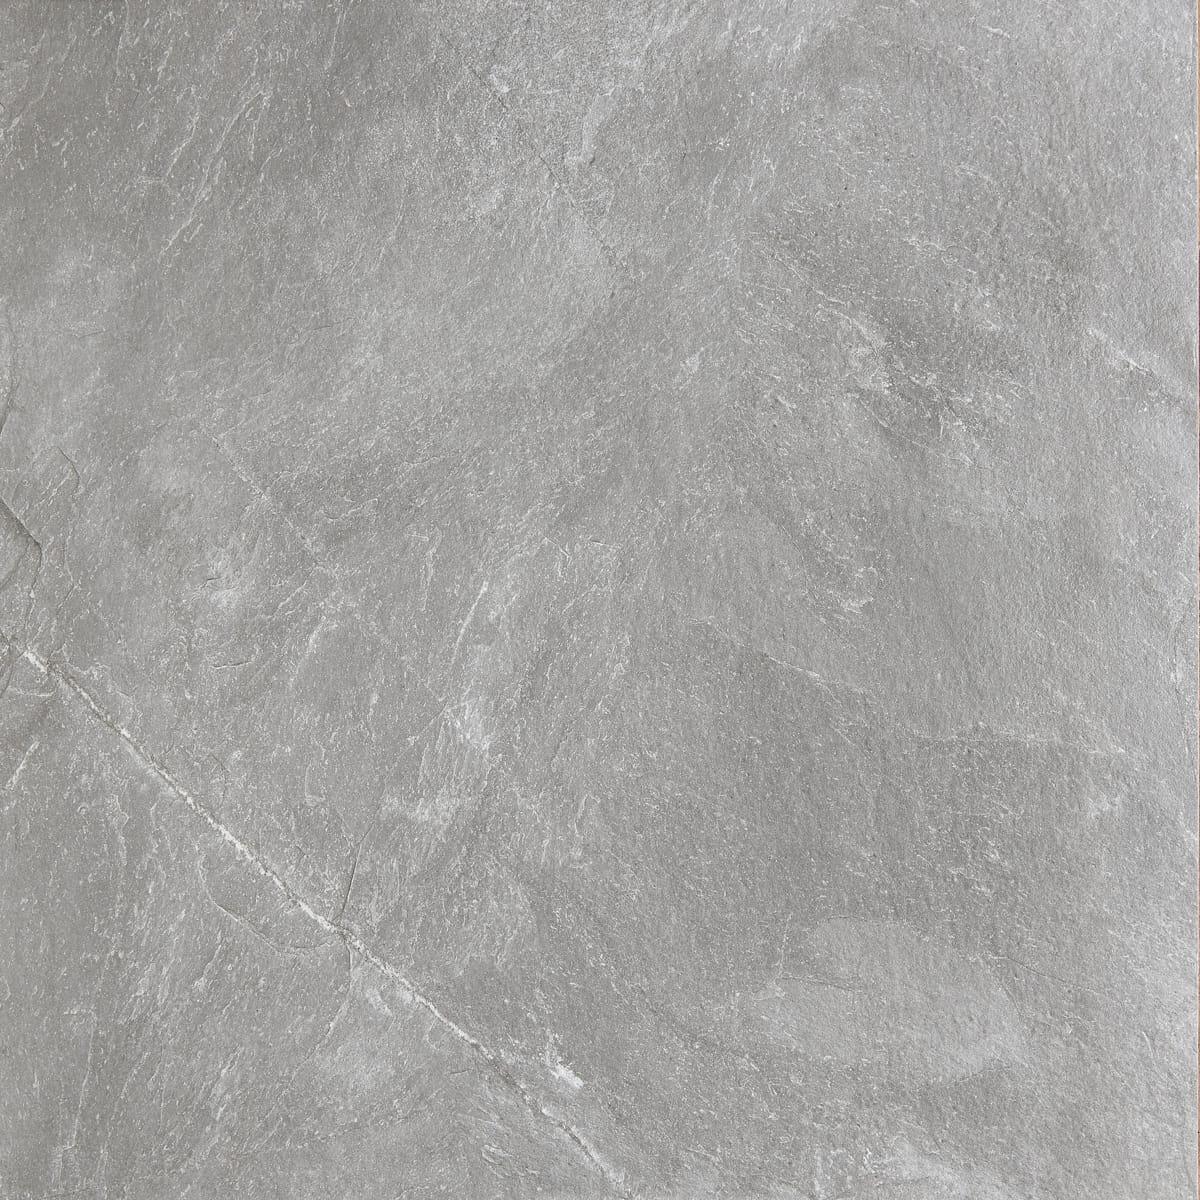 FOTO 1 sandstone grey ant 75x75 3